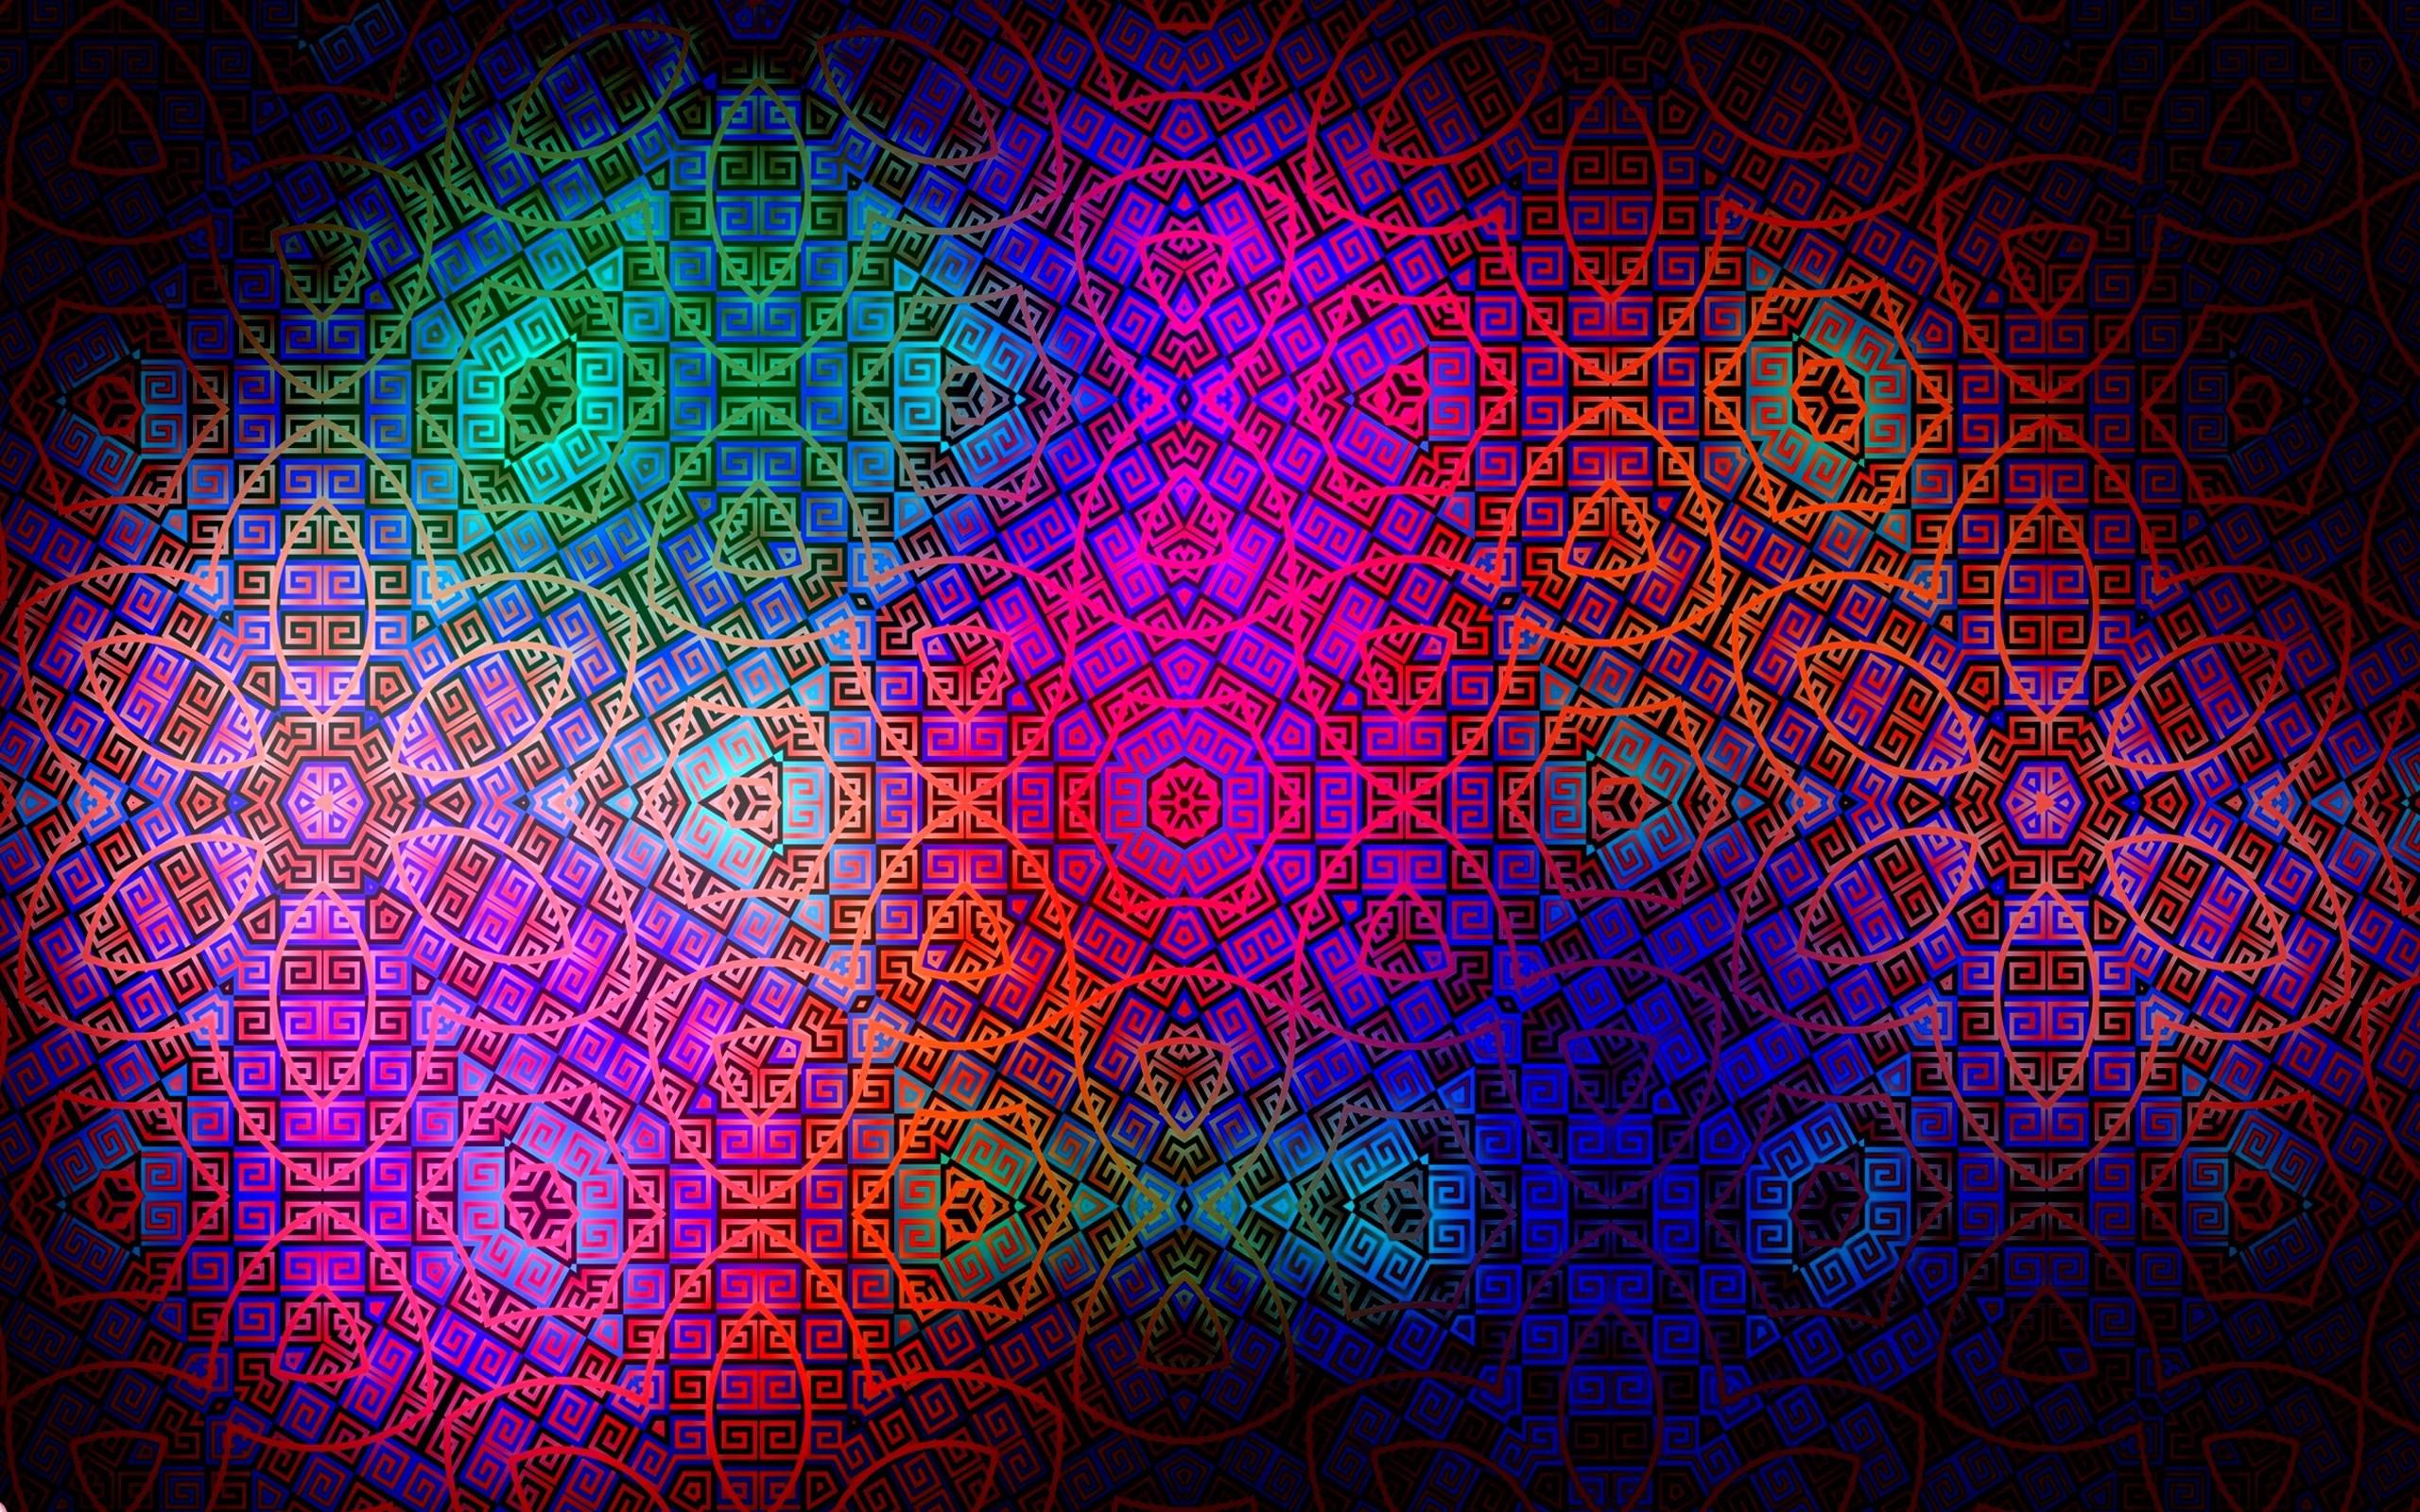 Wallpaper pattern, color, colorful, dark